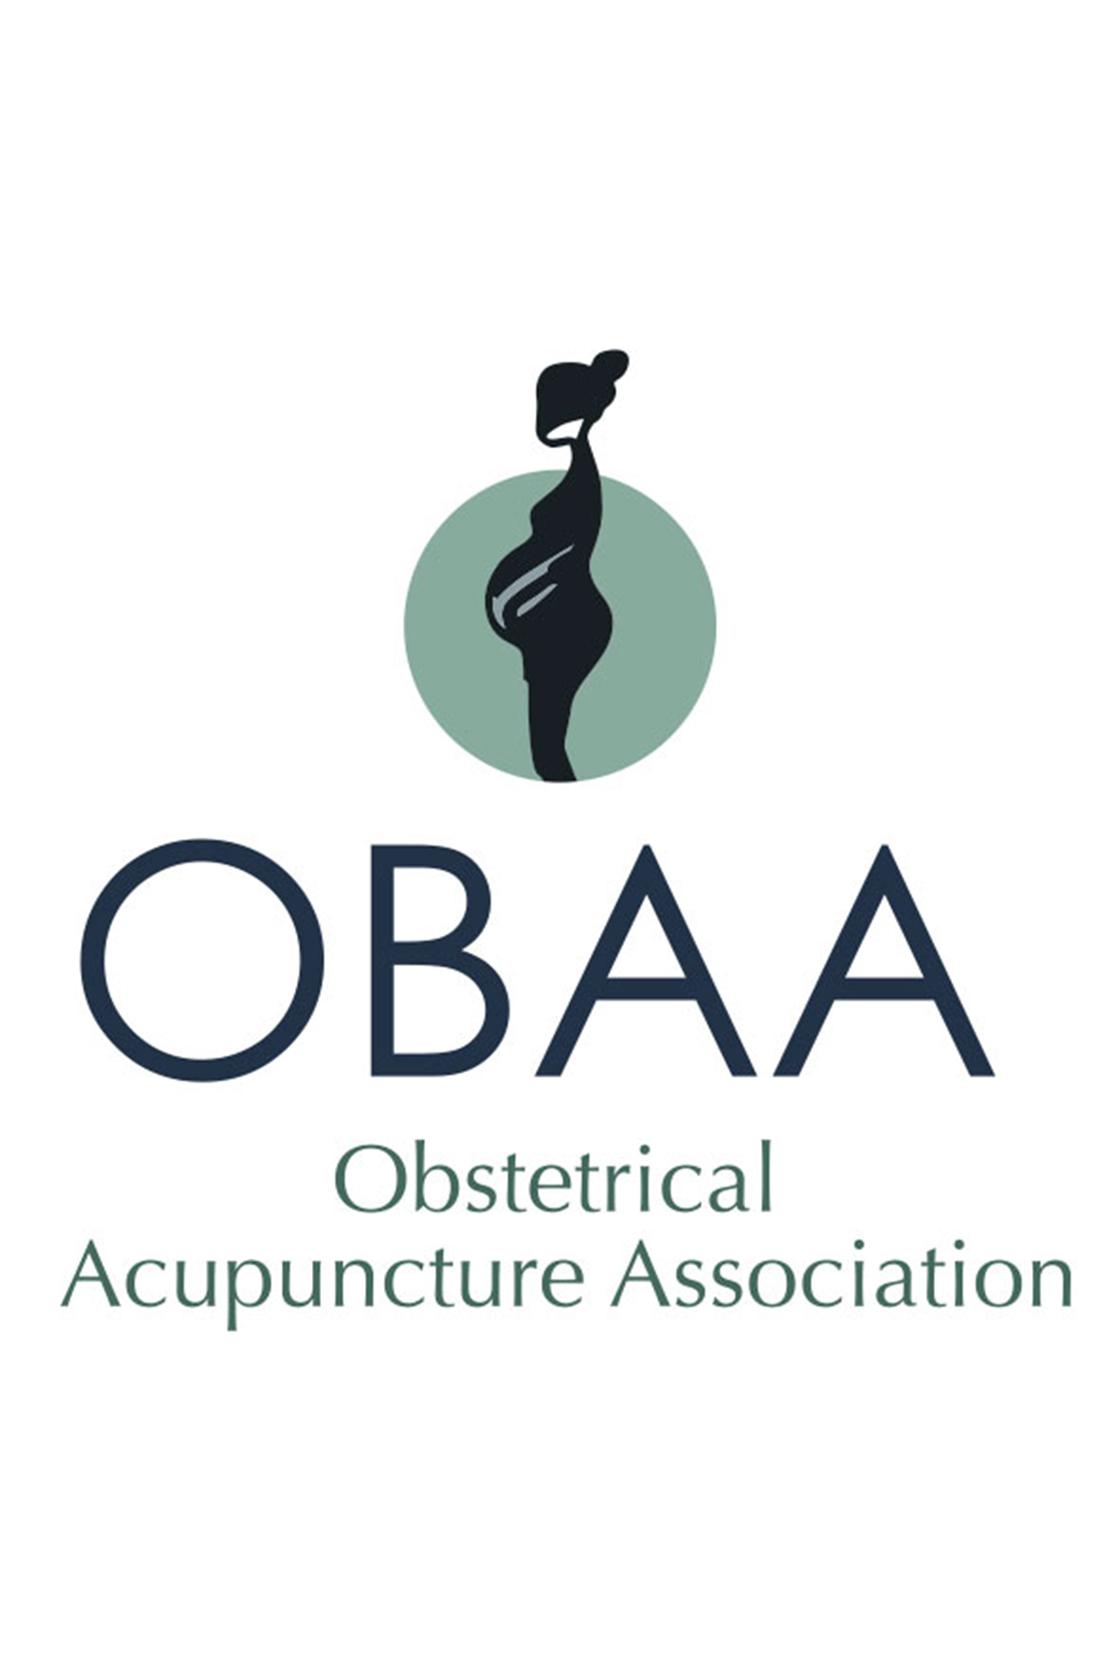 Images of OBAA, Emile Salomons, Sarah Budd, Debra Betts